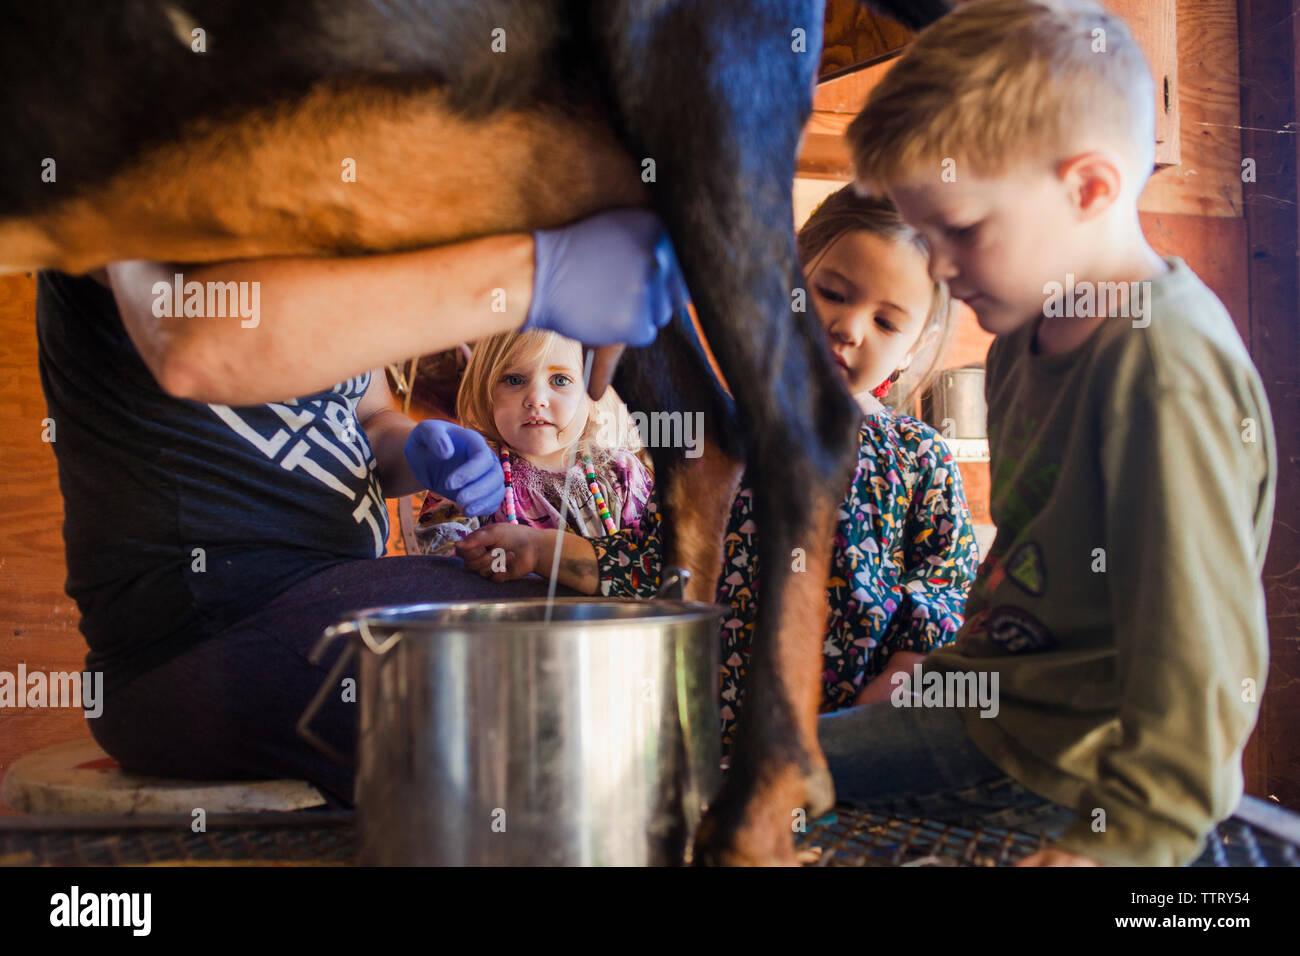 Children looking at farmer milking goat at farm - Stock Image